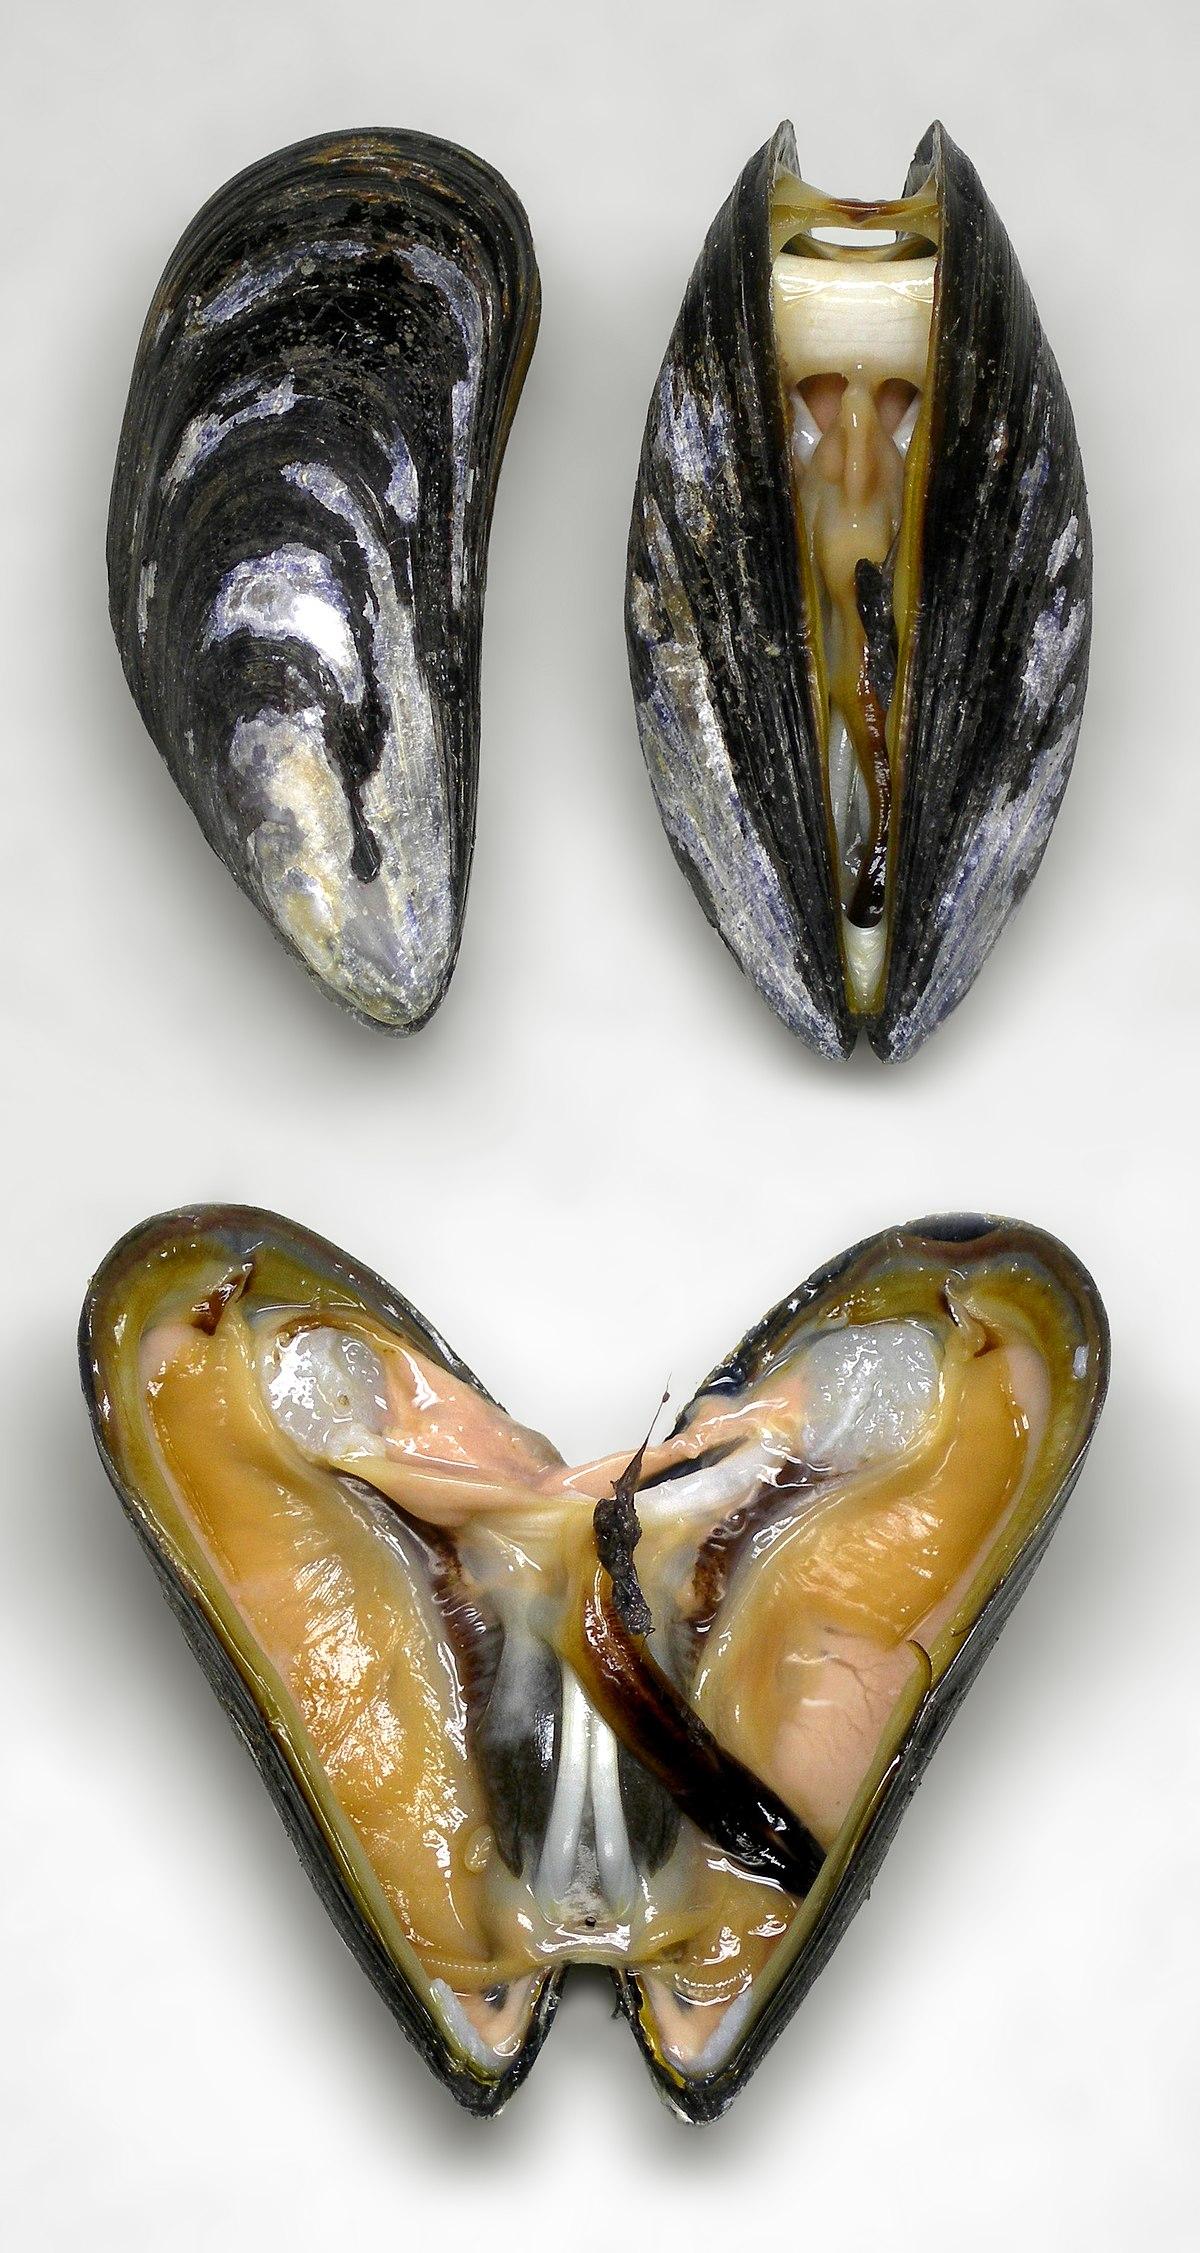 What Mollusk Uses Natural Buoyancy